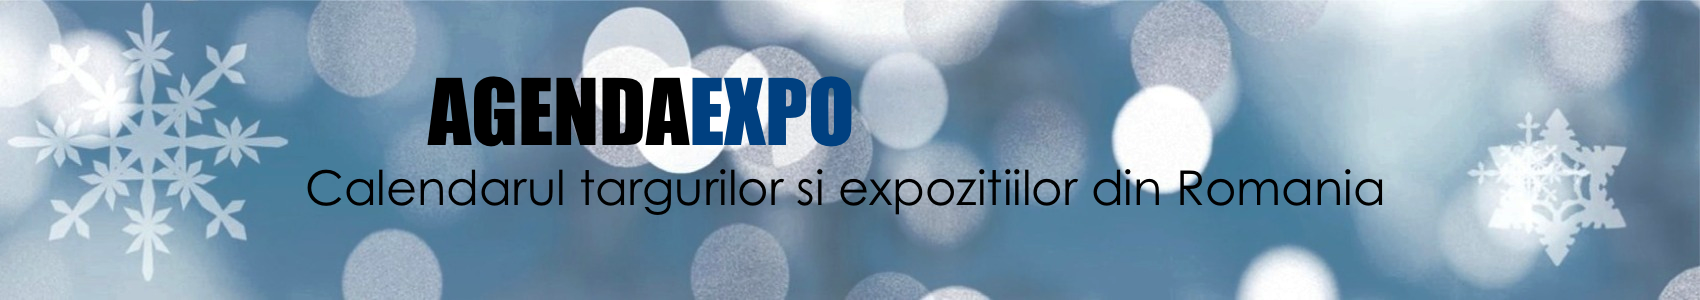 AGENDA EXPO